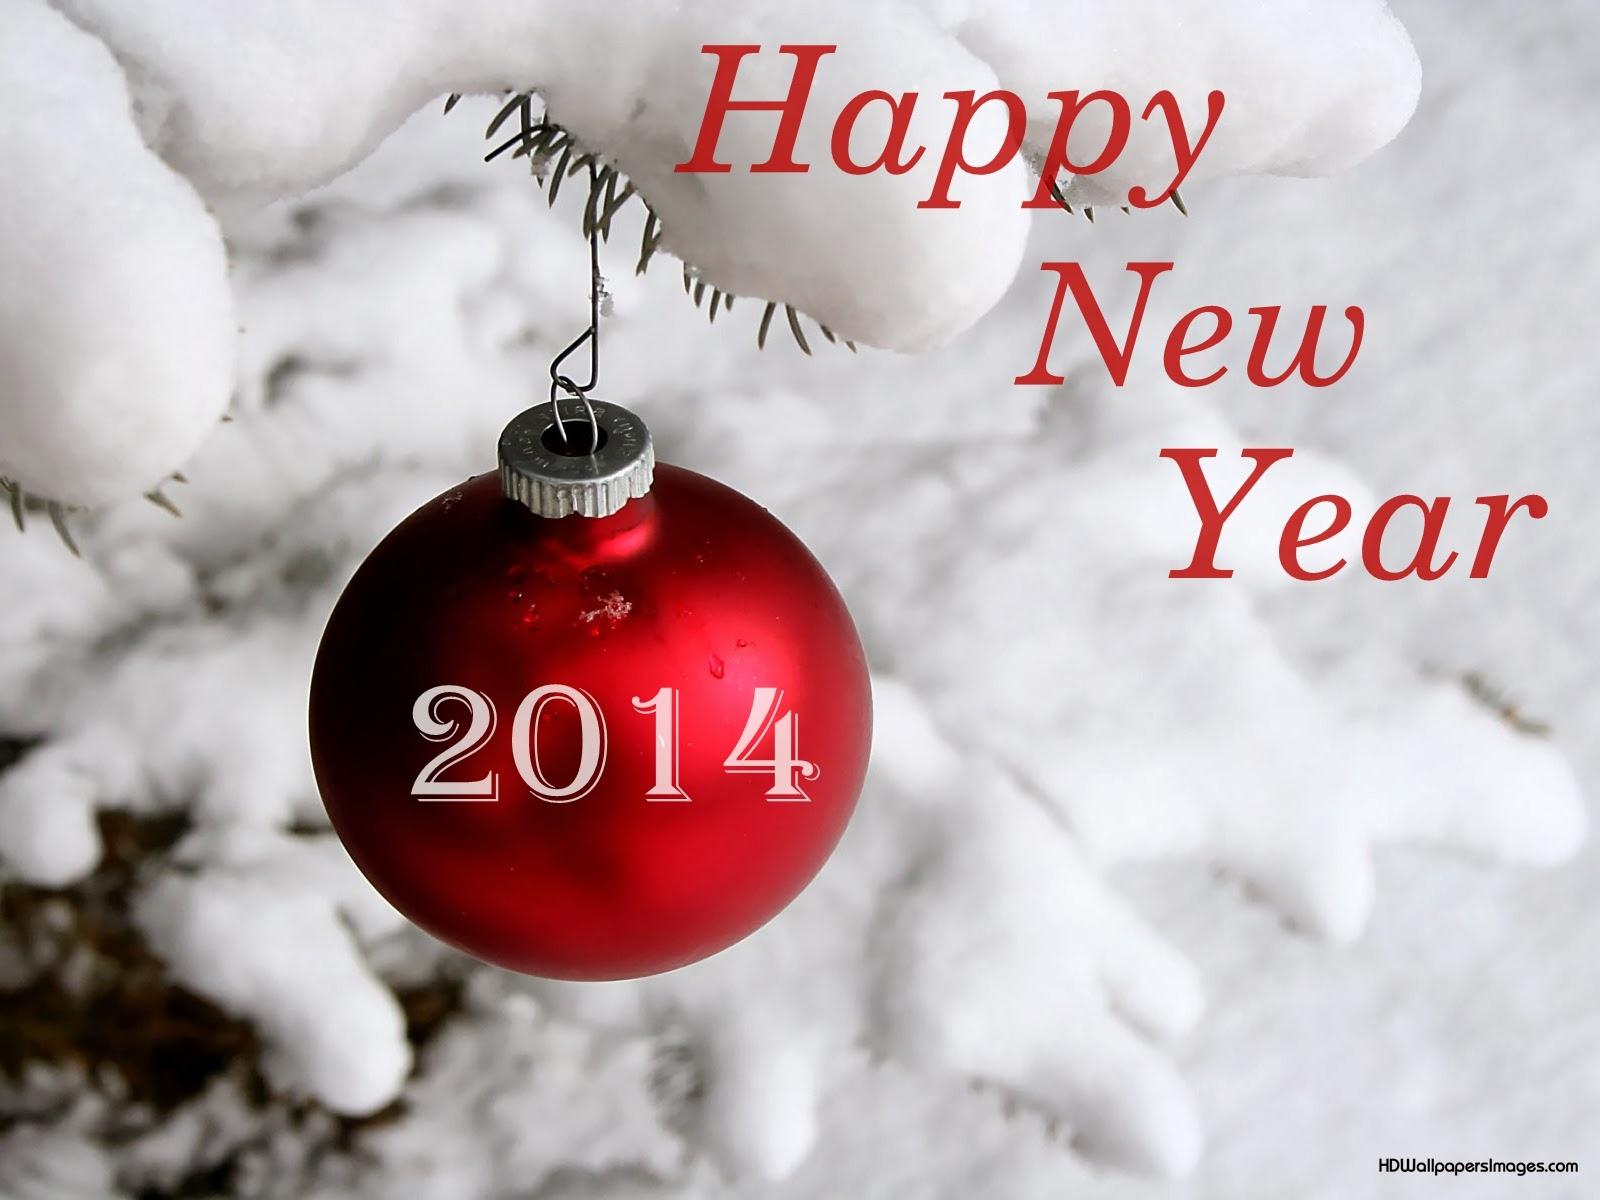 happy new year 2014: Happy new year 2014 e-cards